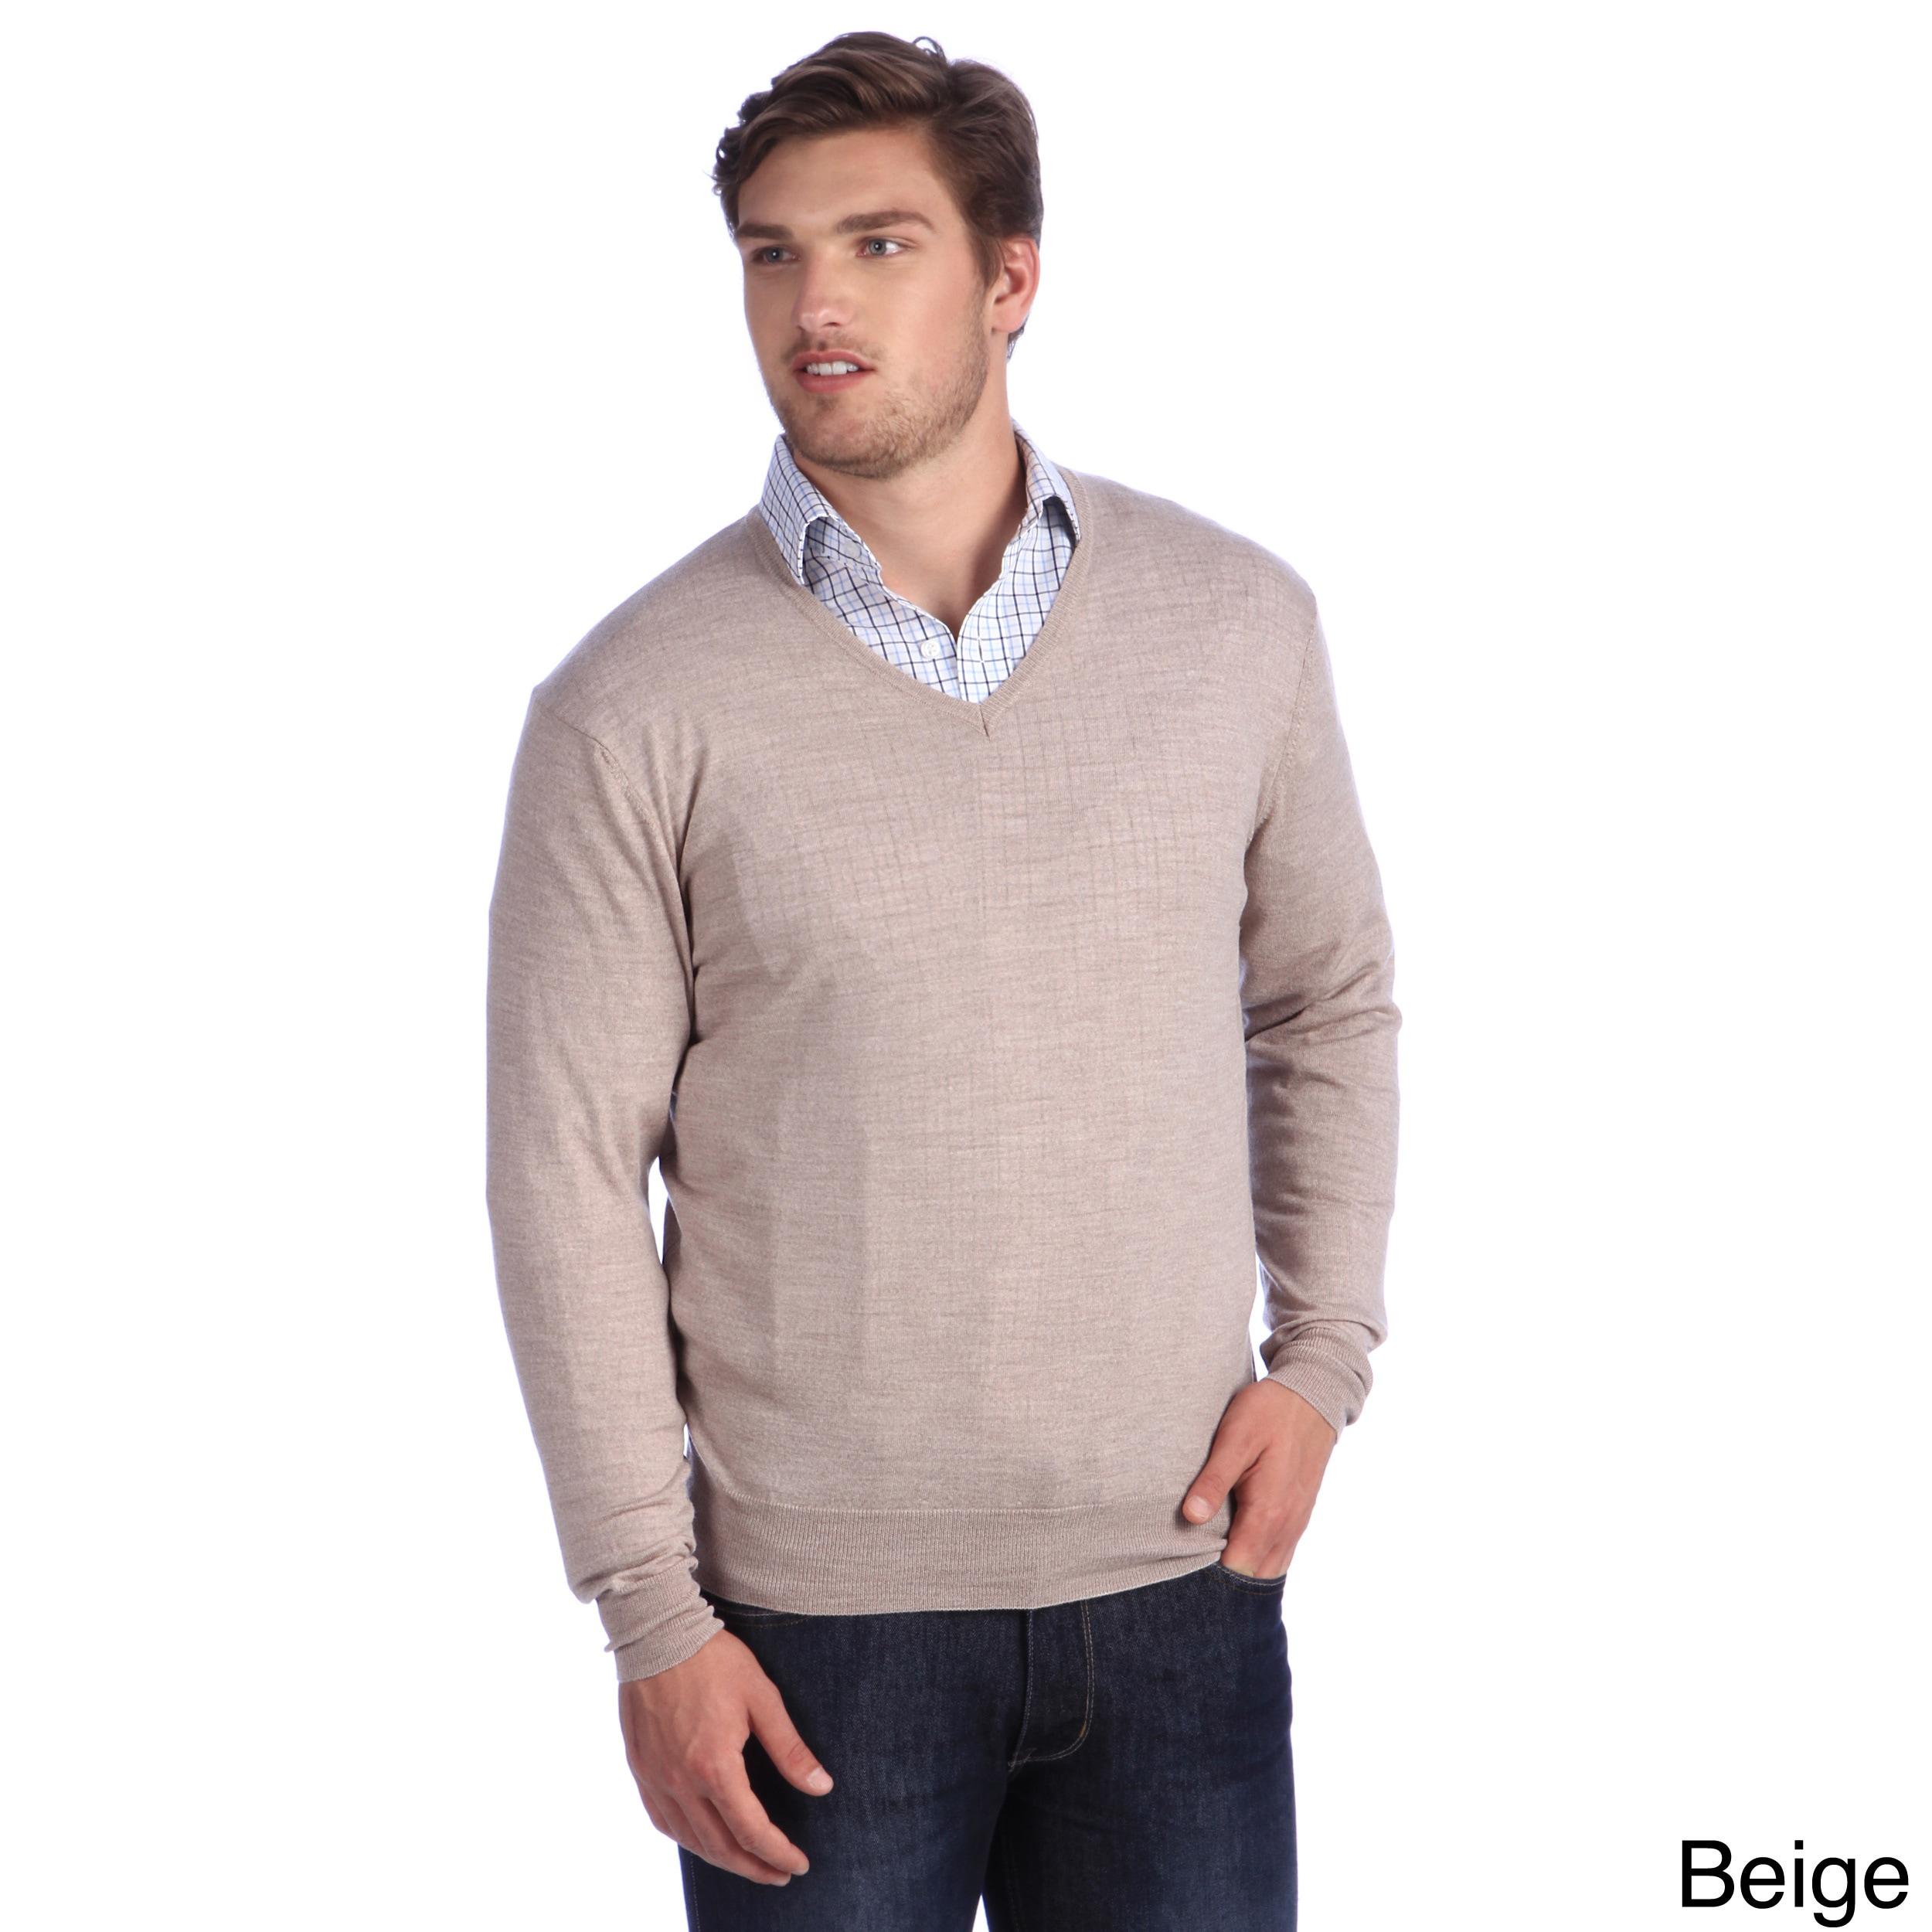 Luigi Baldo Luigi Baldo Italian Made Mens Fine Gauge Merino V neck Sweater Beige Size Small